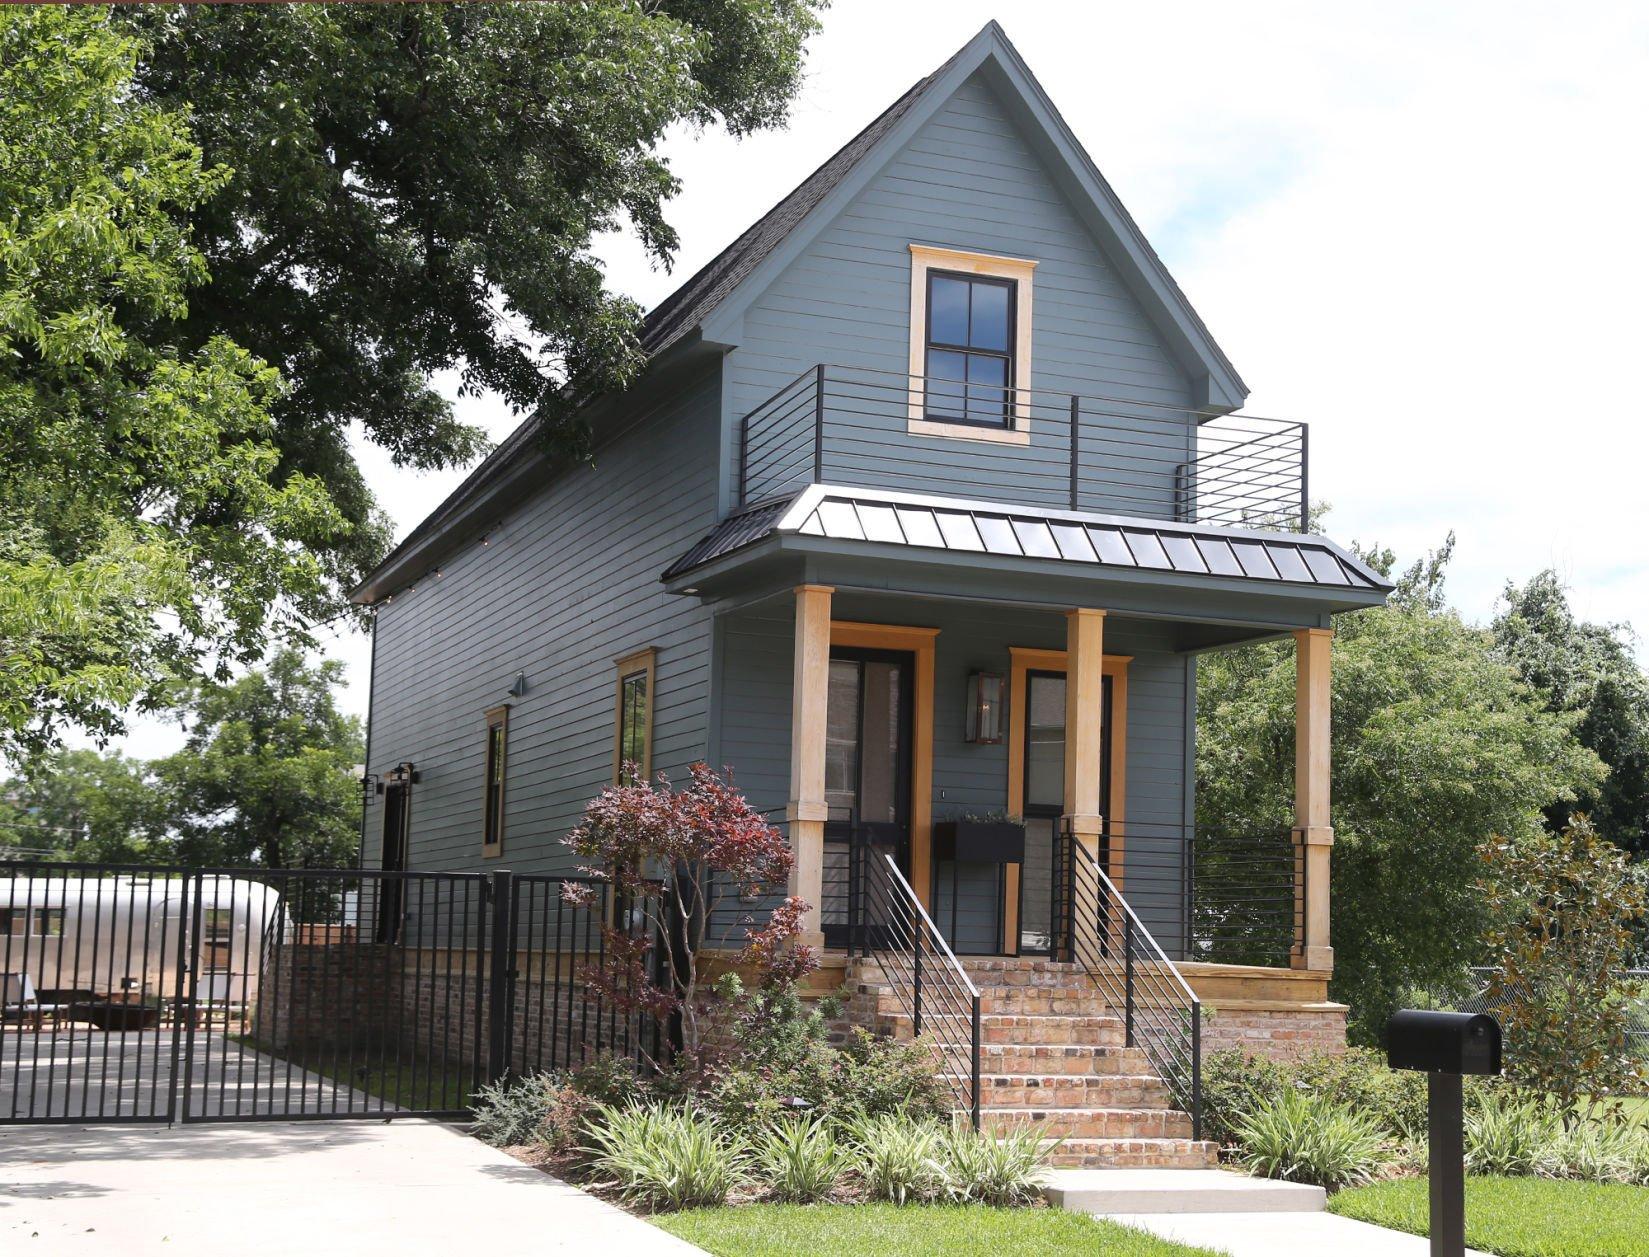 U0027Fixer Upperu0027 House. Buy Now